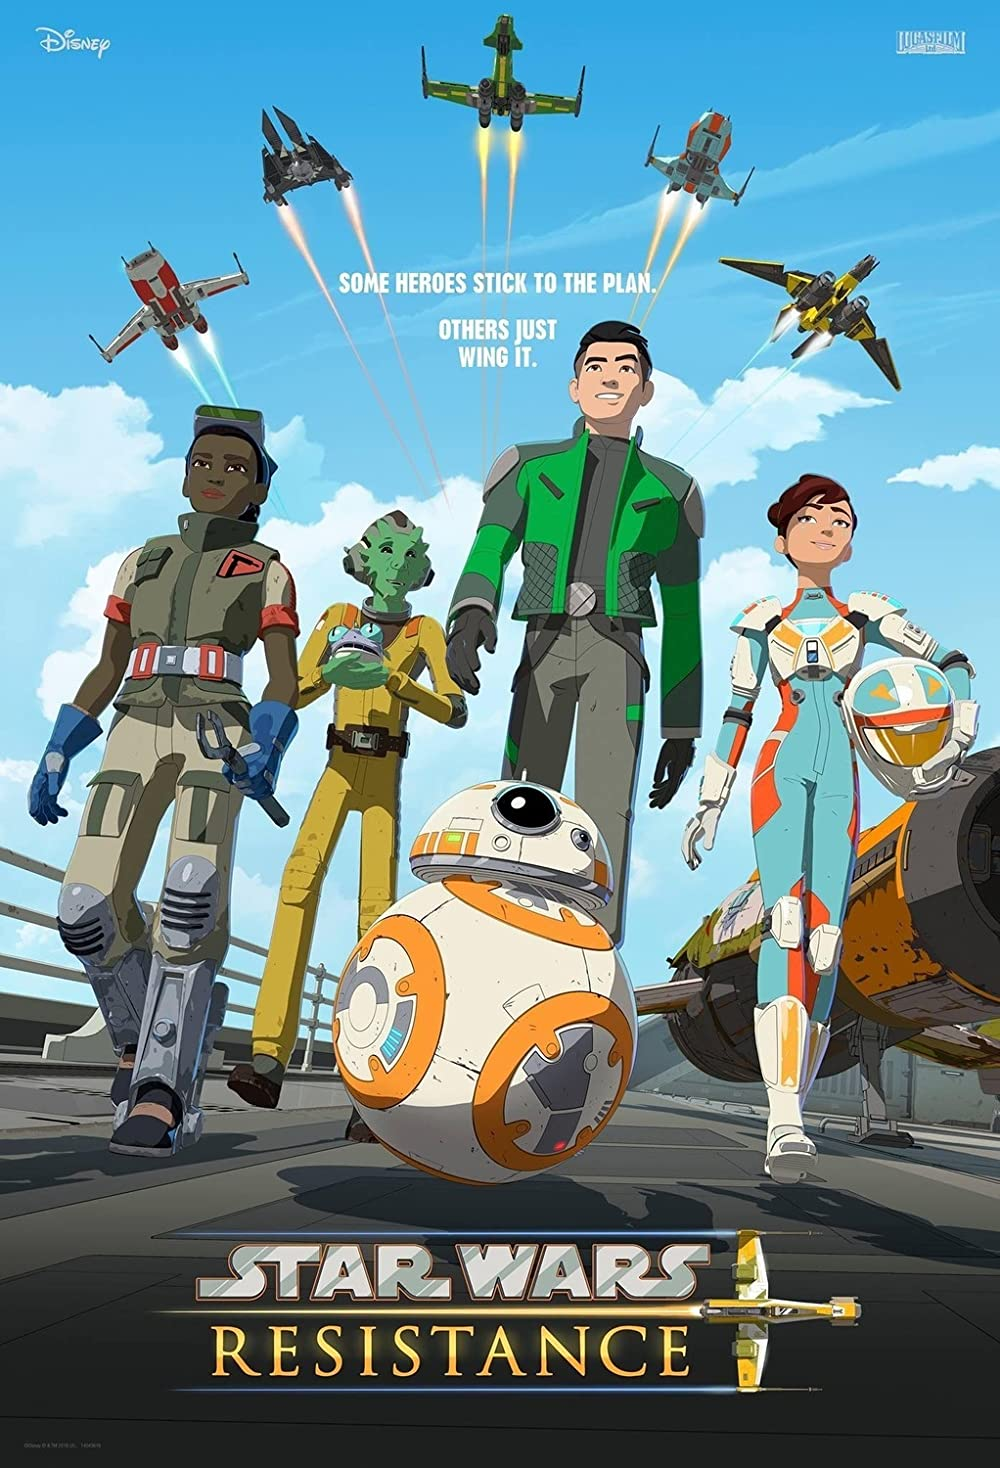 >Star Wars Resistance สตาร์วอร์ เรสซิเดนซ์ Season1-2 ตอนที่ 1-40 พากย์ไทย